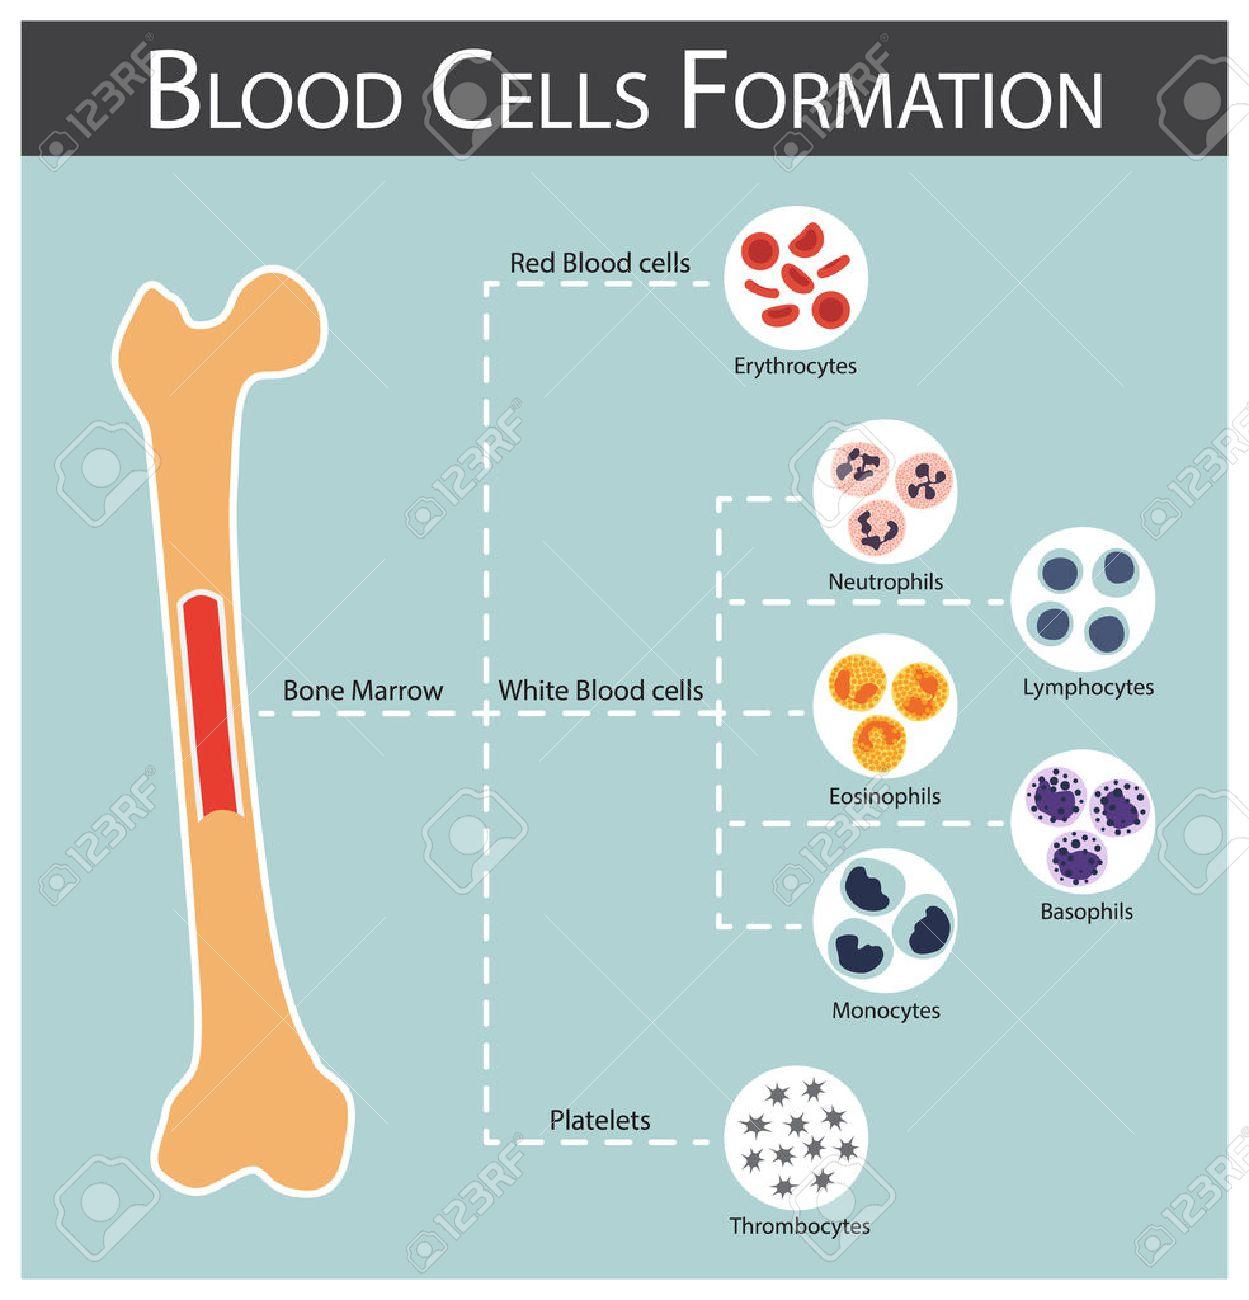 Blood cells Formation ( bone marrow produce blood cells series : erythrocytes , lymphocytes , neutrophils , monocytes , eosinophils , basophils , thrombocytes ) Haematology concept and infographics - 52184113